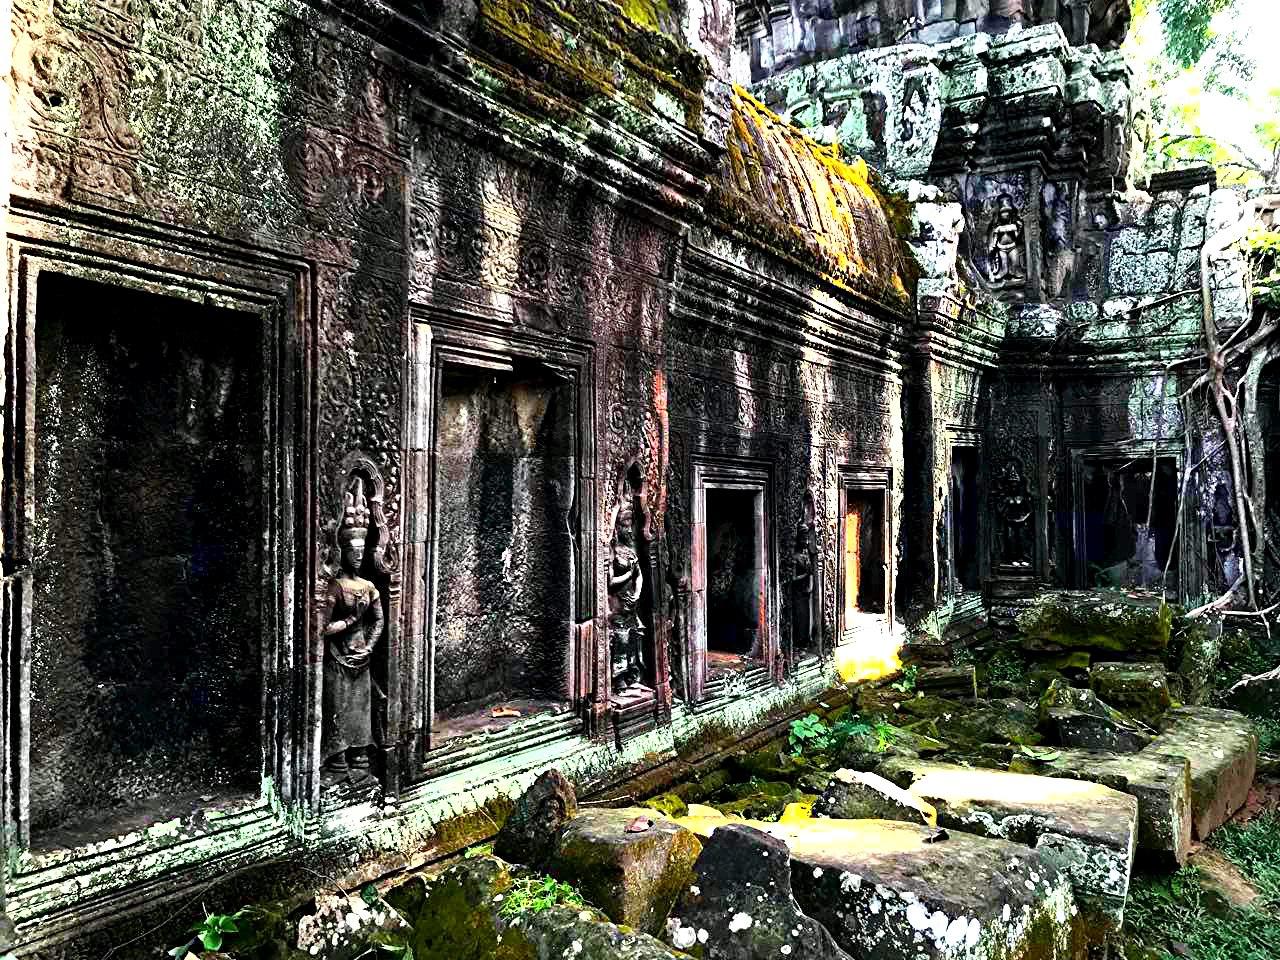 Елена Руденко (Валтея). Камбоджа. Ангкор. LJ1PTPcxa90